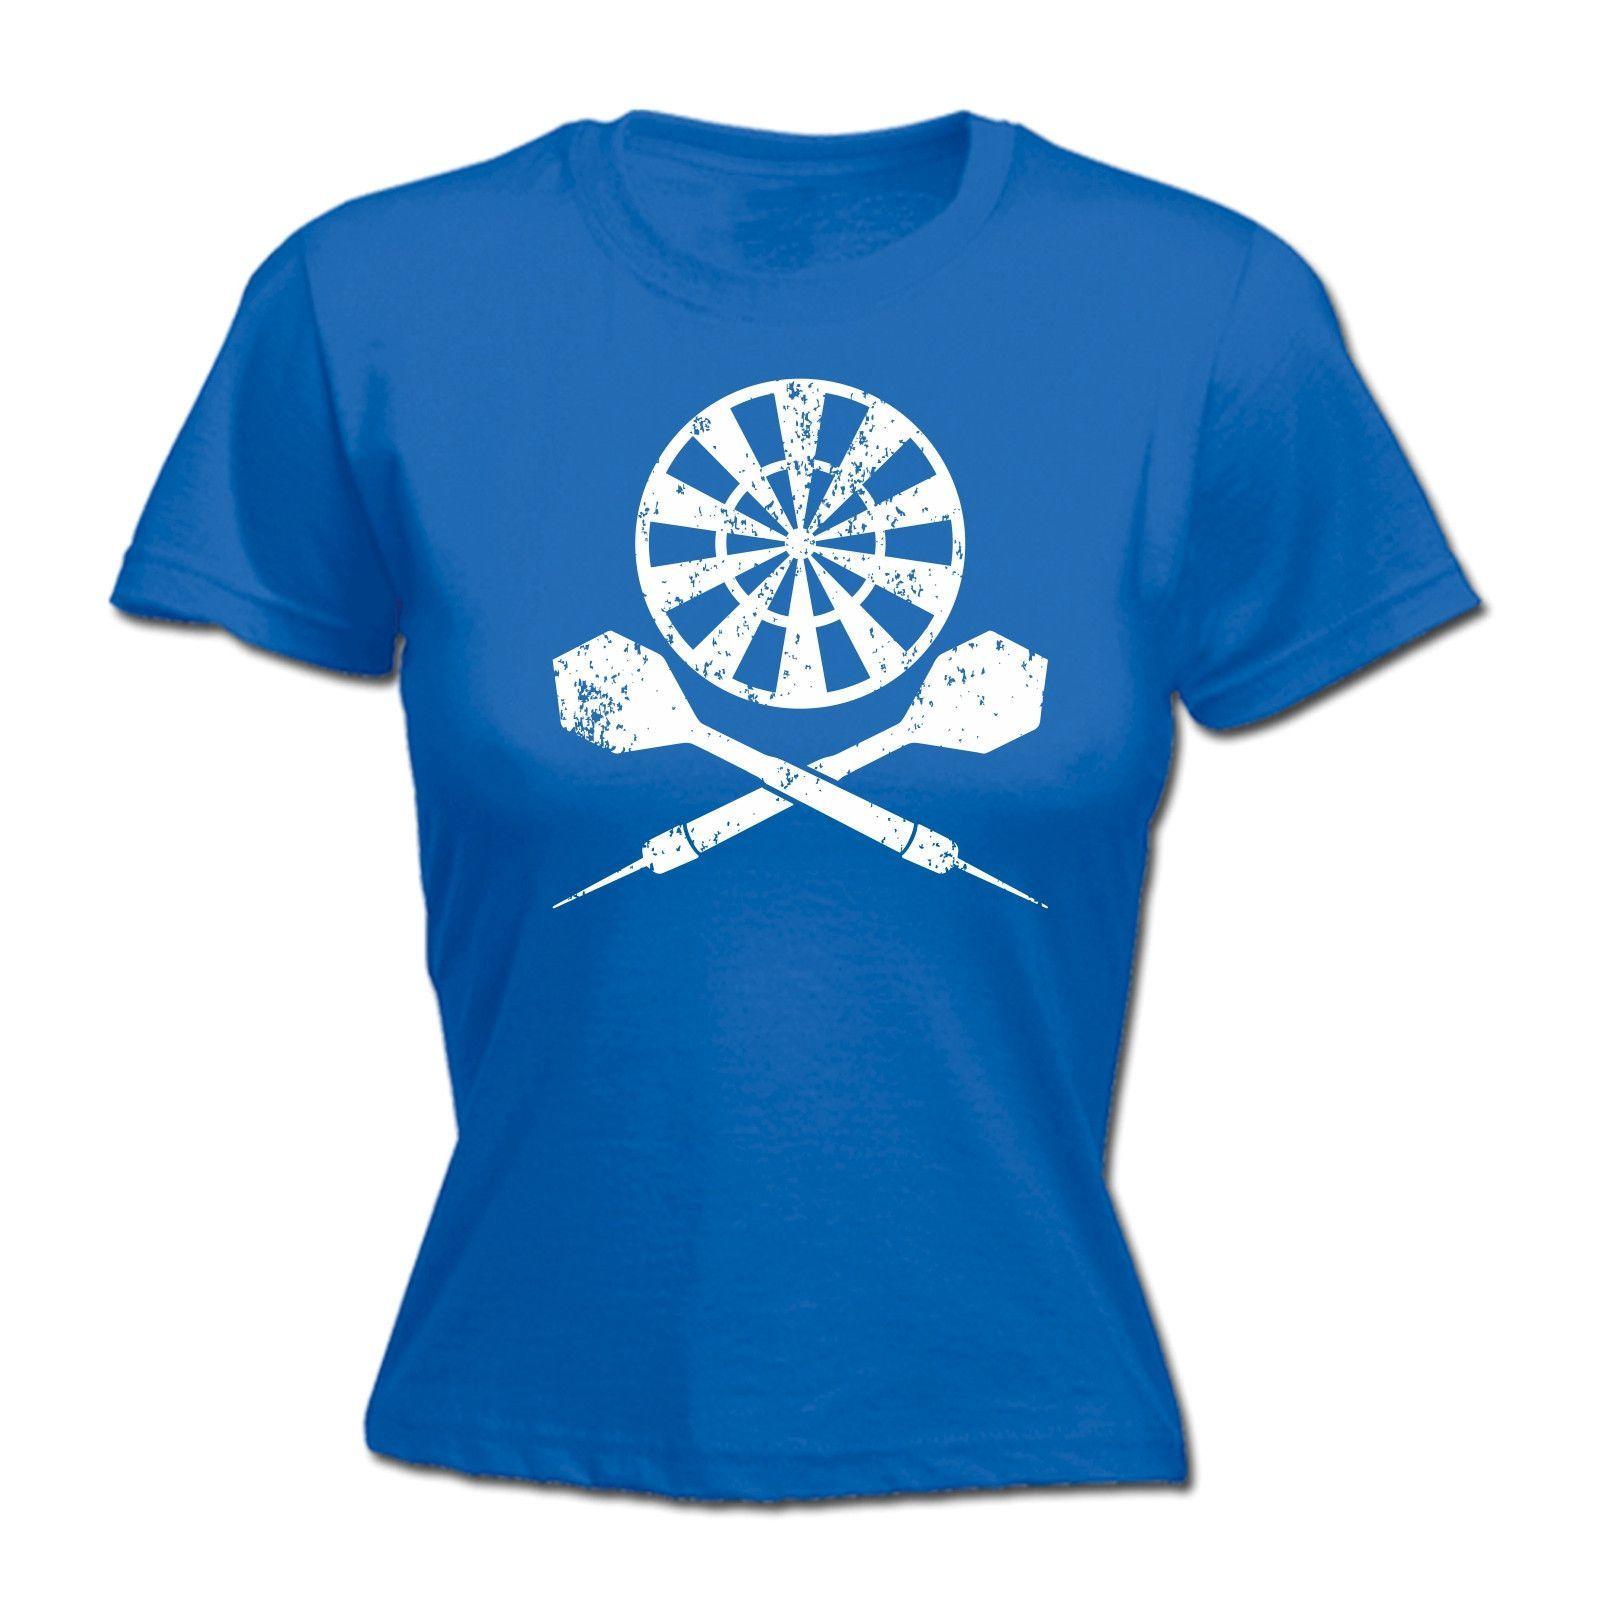 123t USA Women's Darts Board ... Cross Design Funny T-Shirt